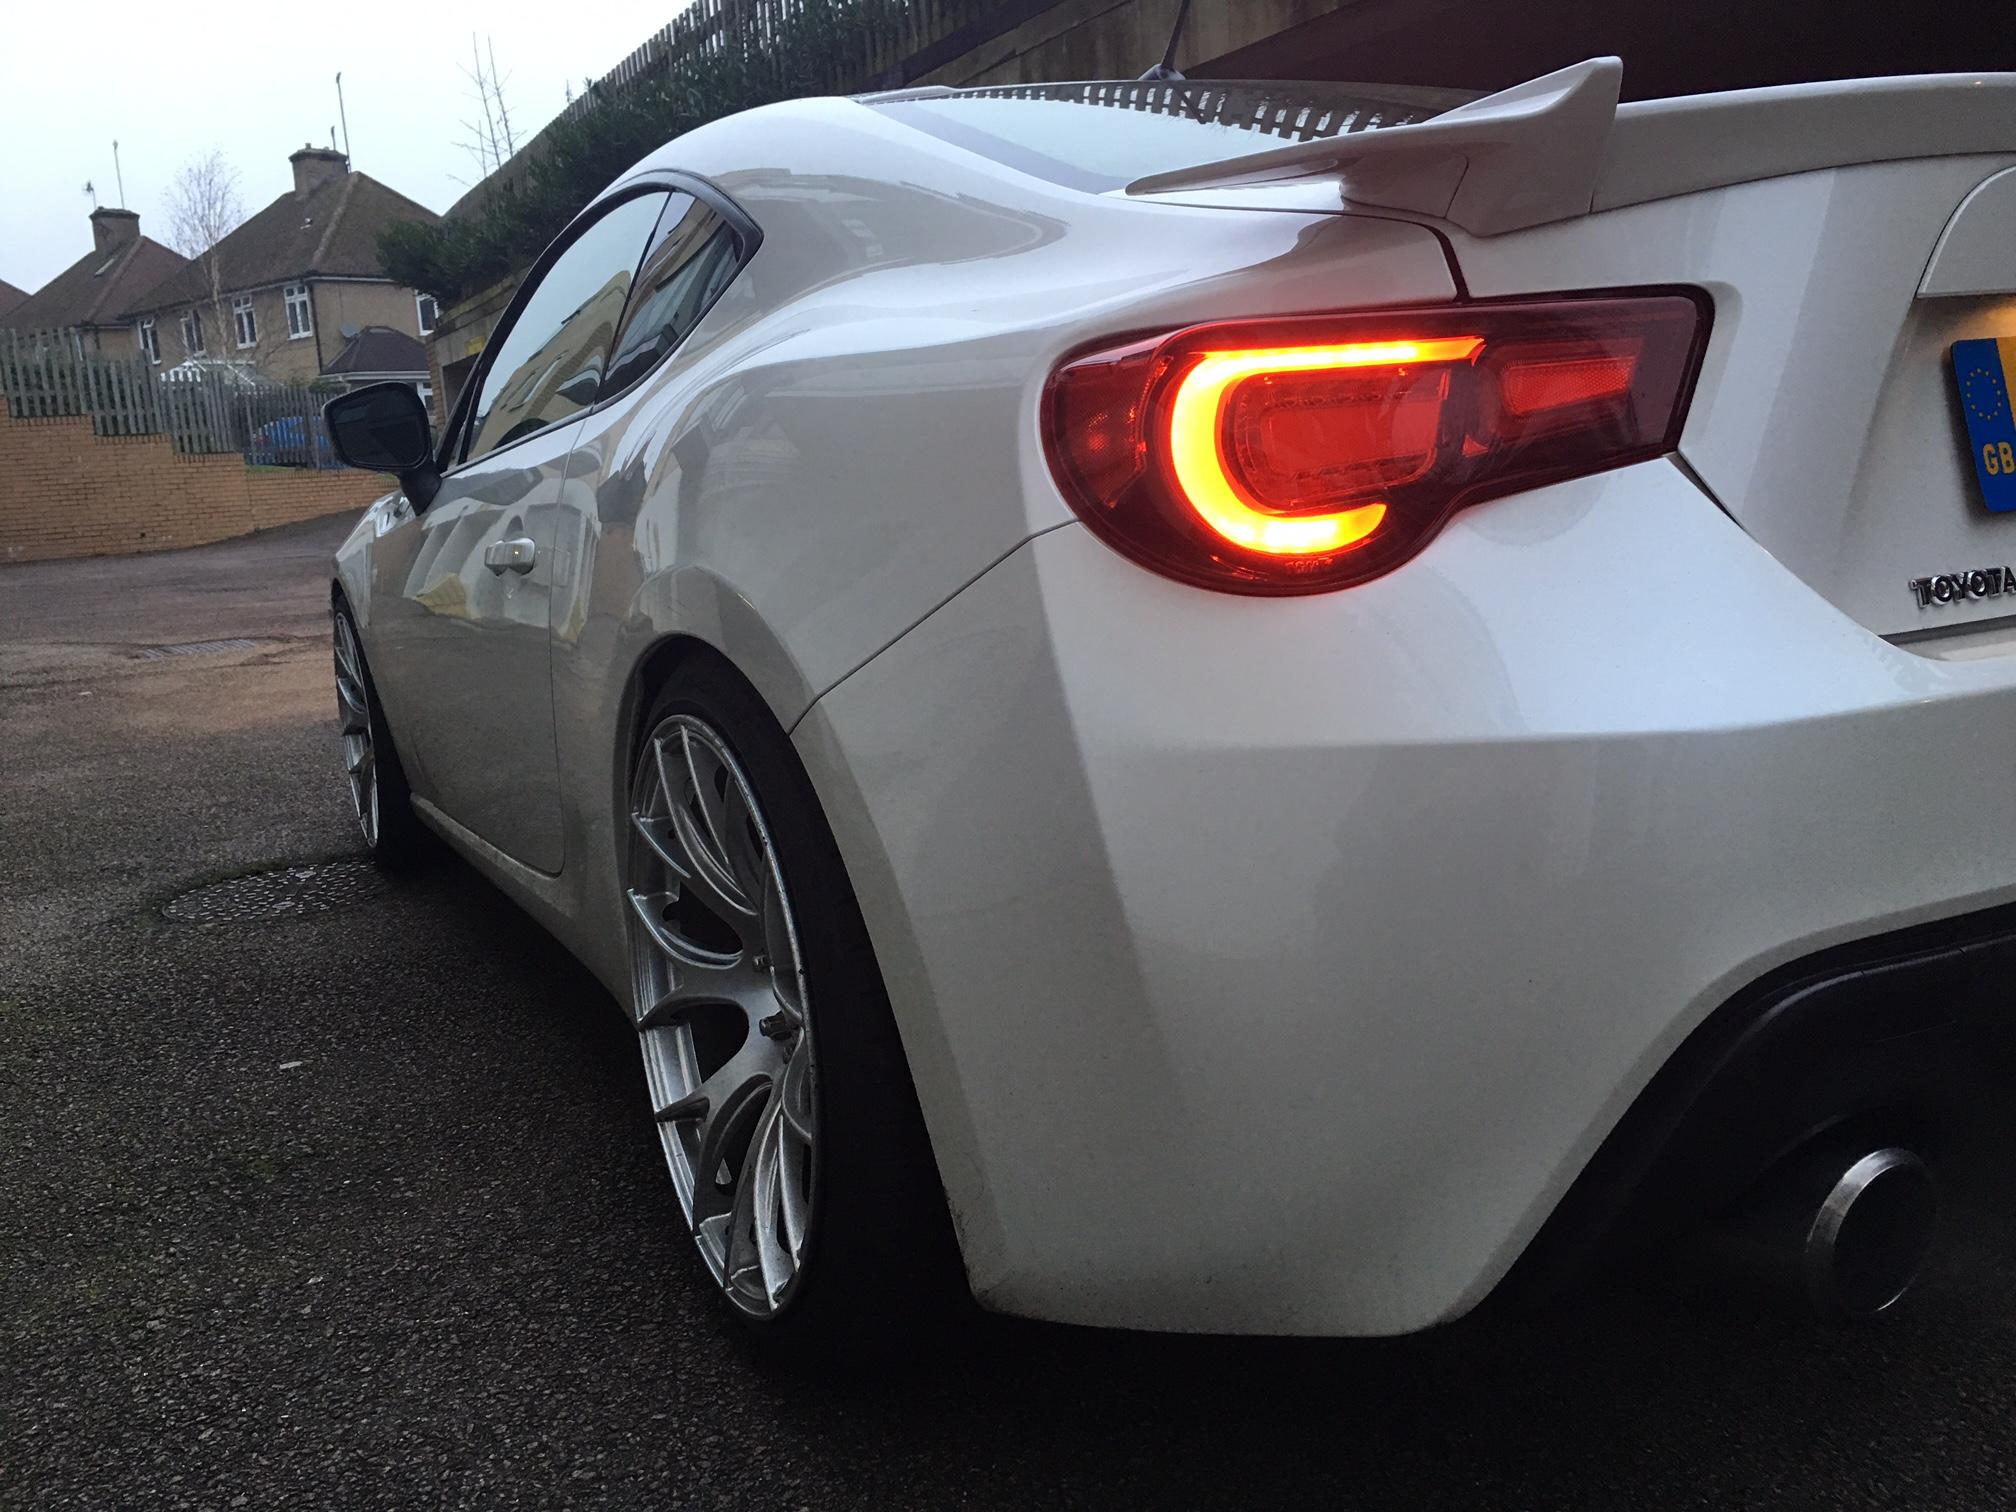 White '13 GT86 KW V3 For Sale - For Sale GT86 / BRZ Cars ...